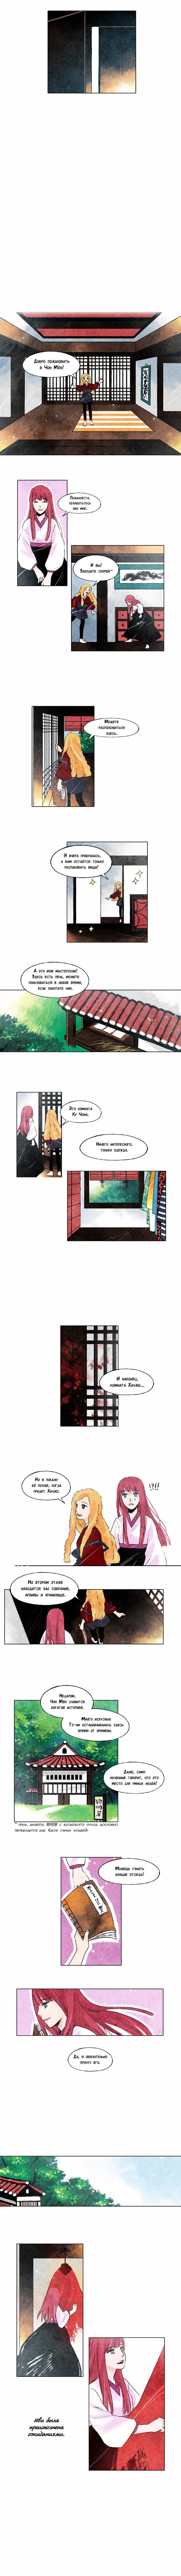 https://r1.ninemanga.com/comics/pic2/39/22503/1257044/1541334776724.jpg Page 2